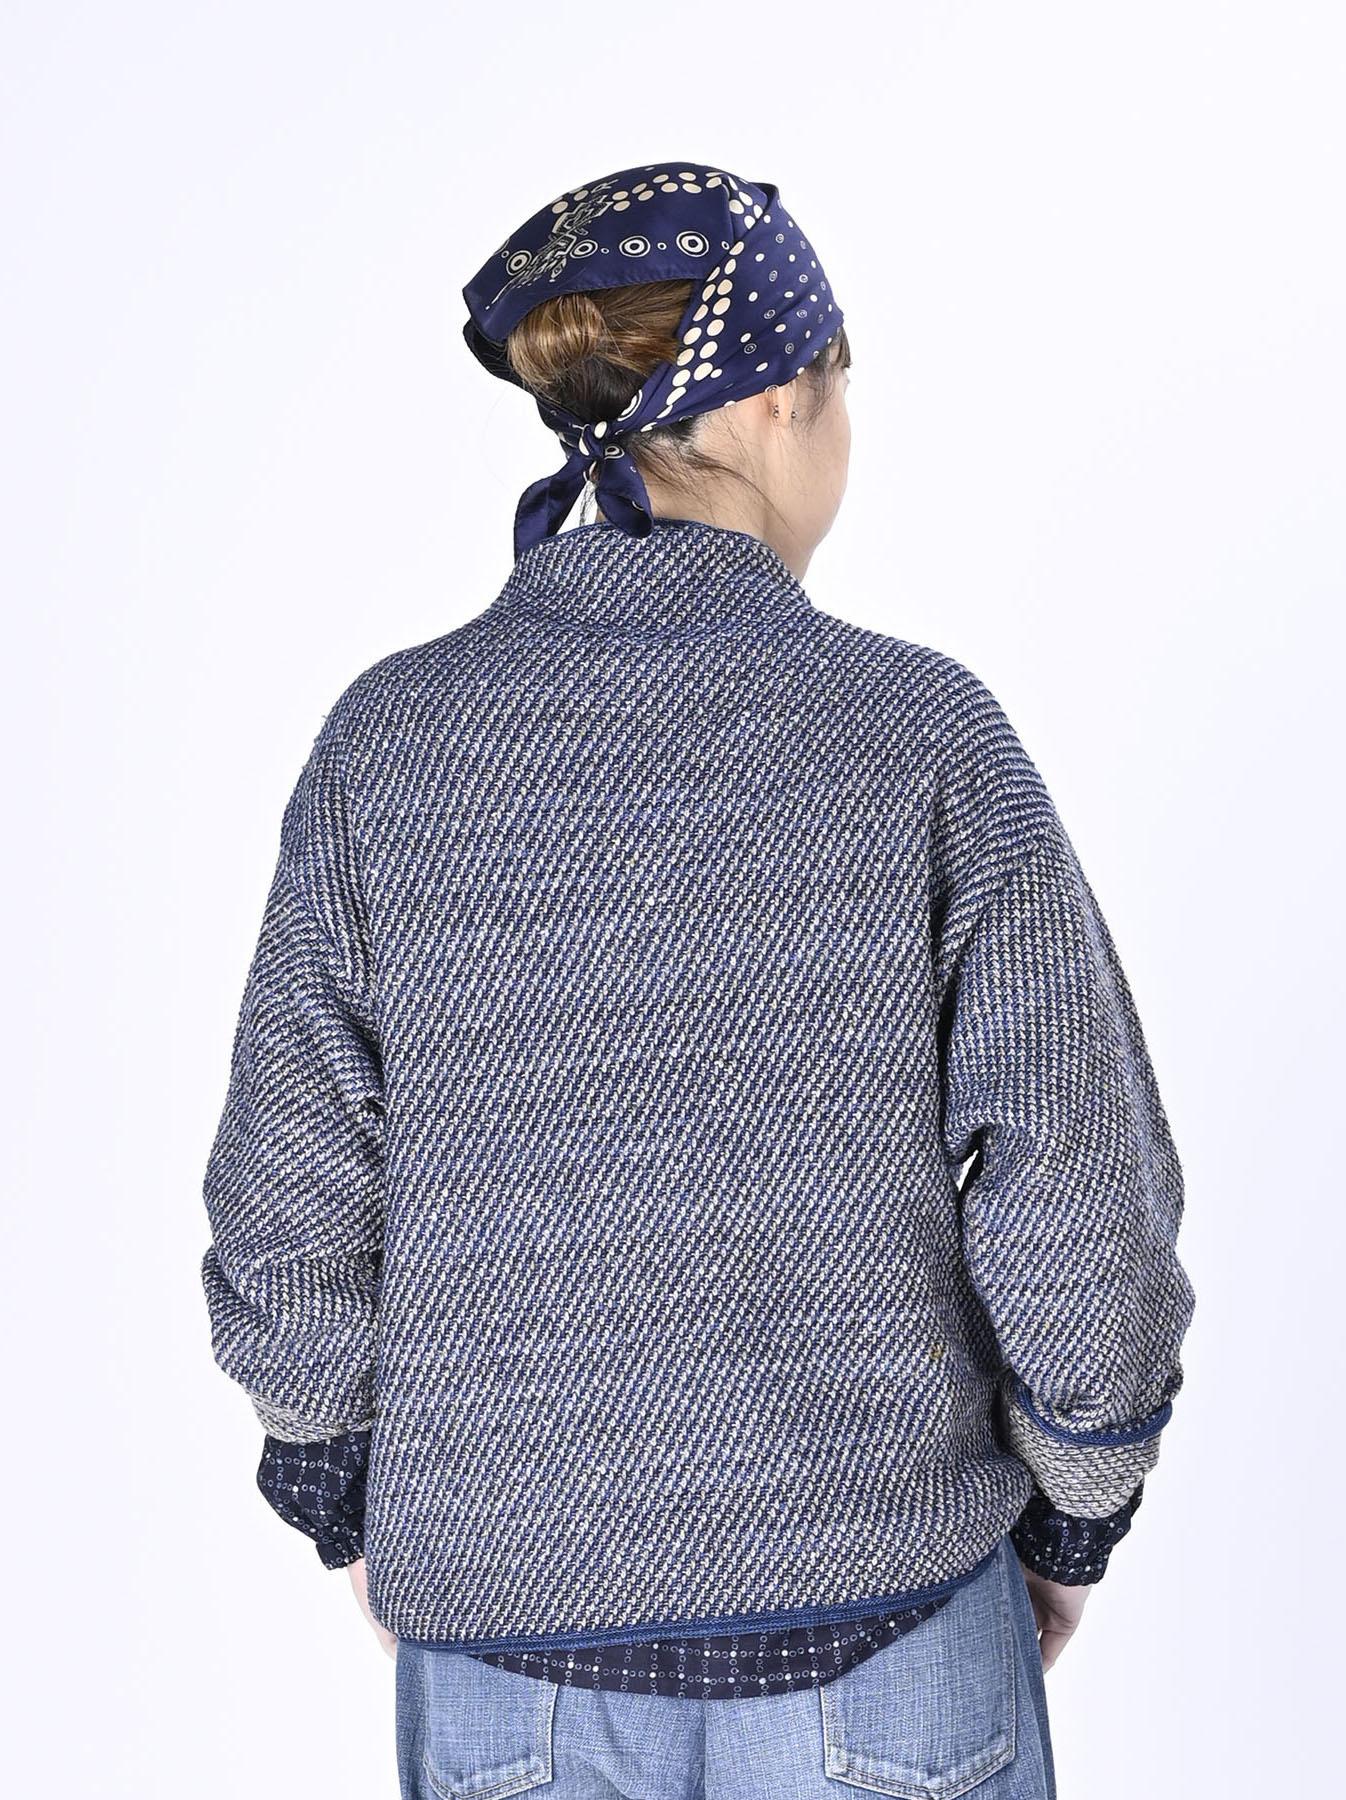 Indigo Knit Jacquard 908 Umahiko Sweater-5